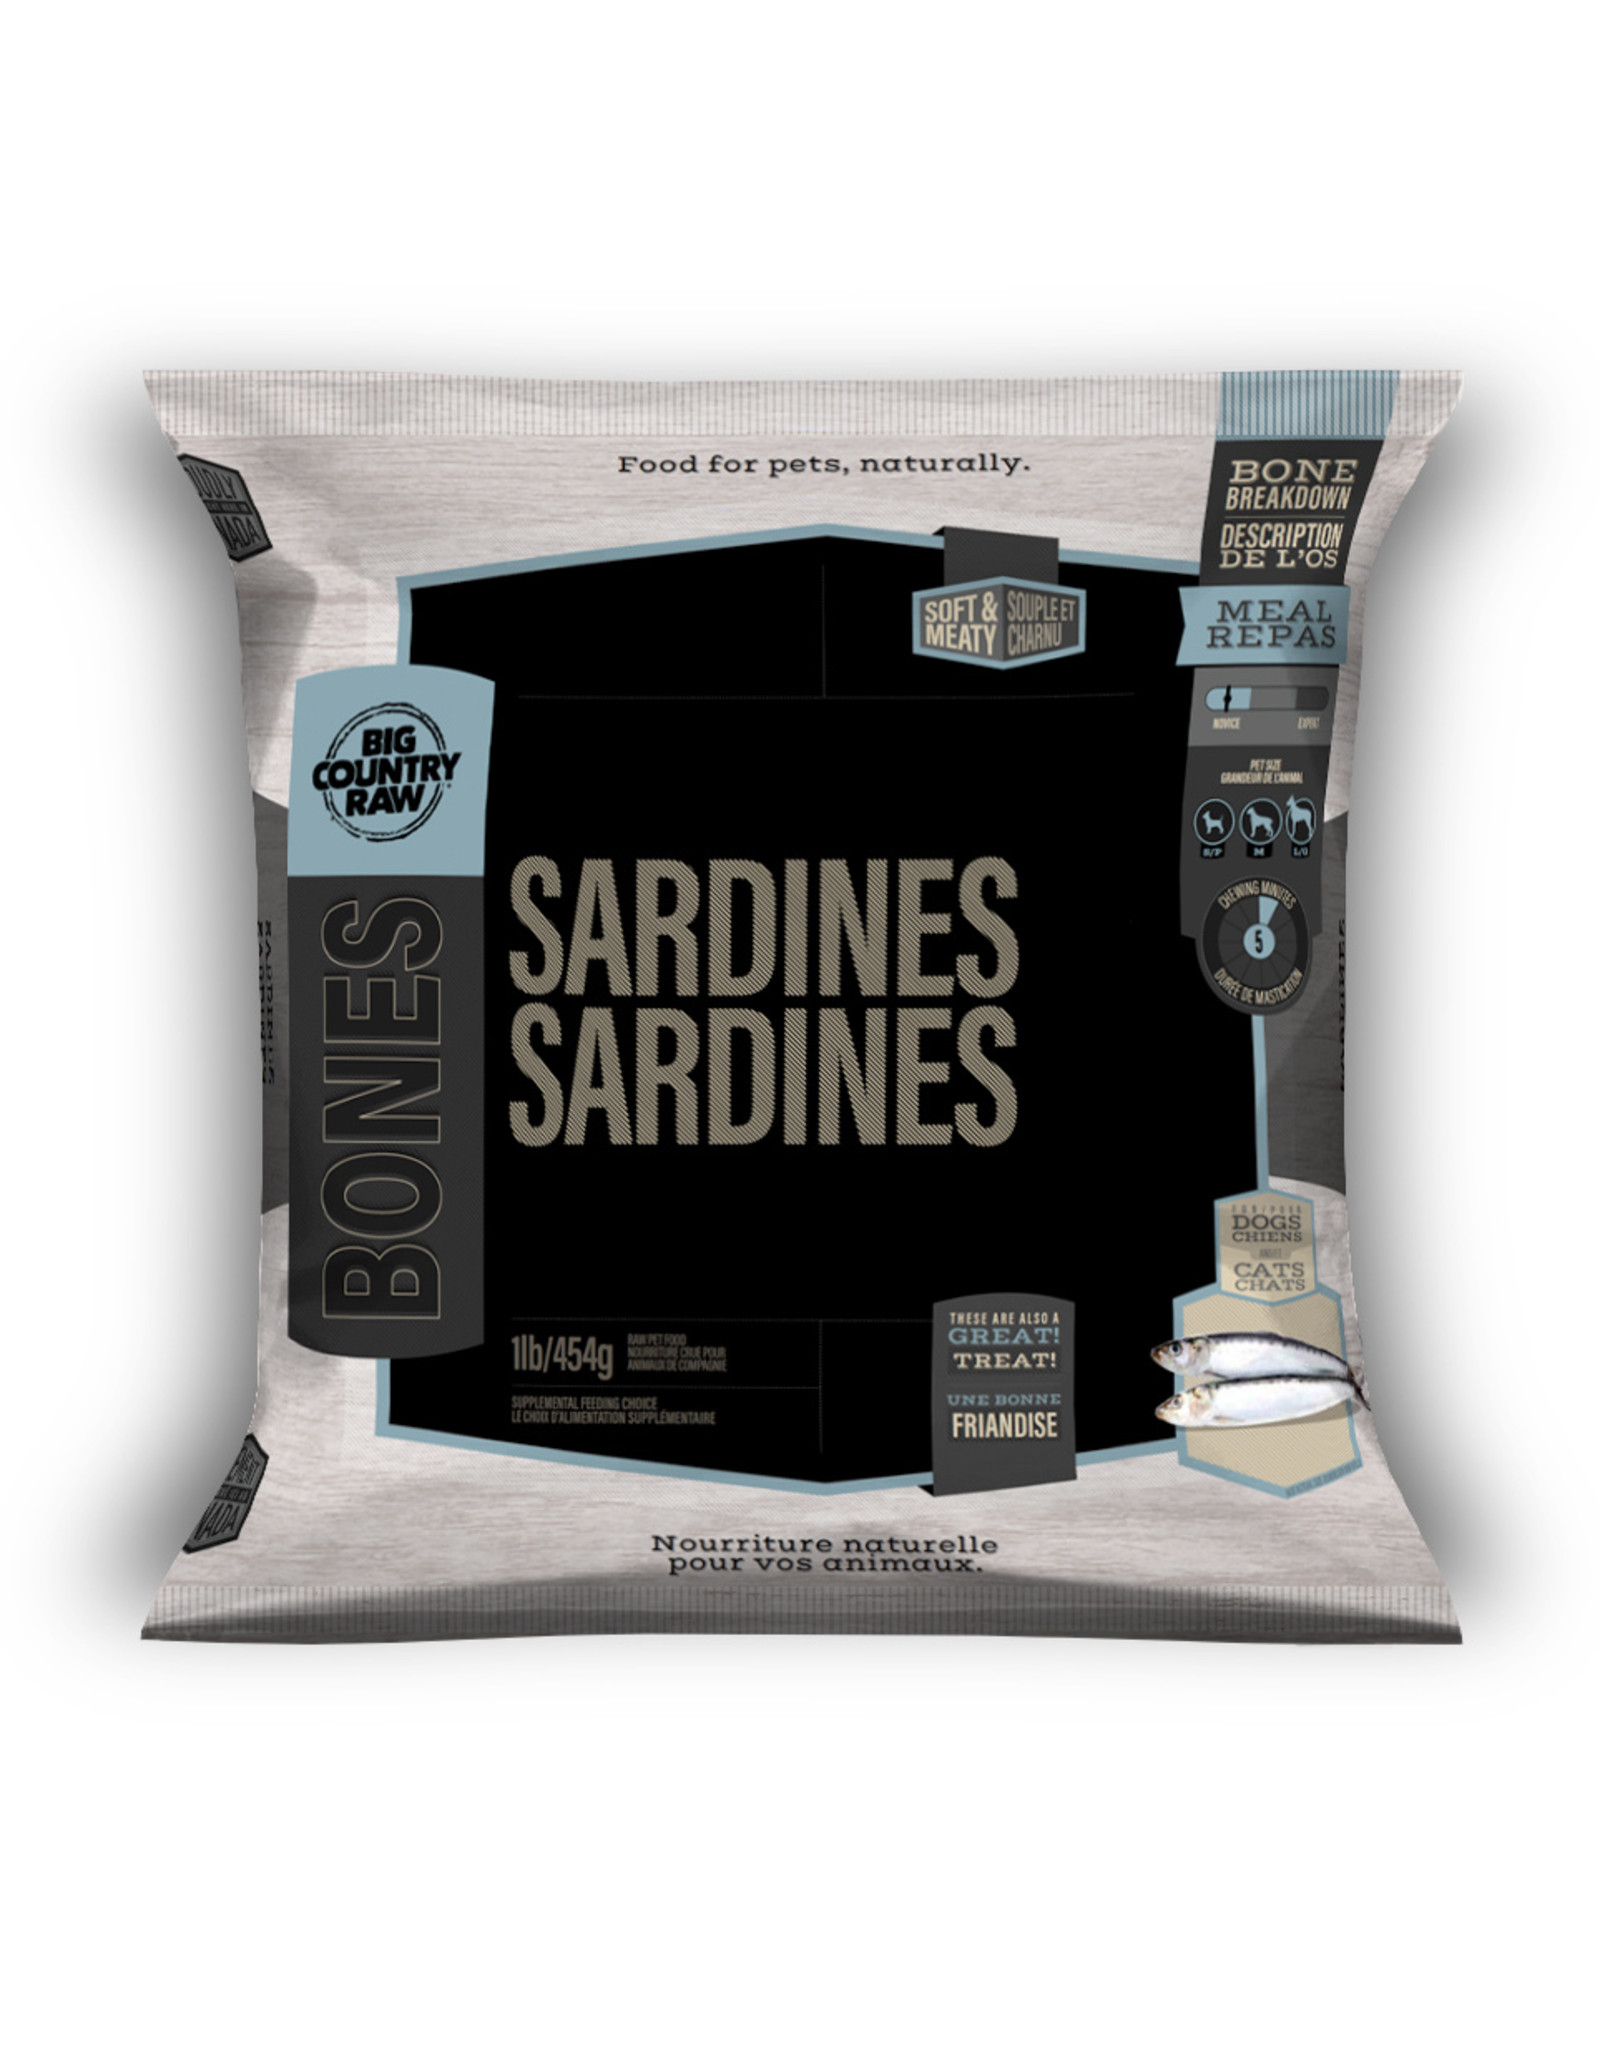 Big Country Raw Sardines 1lb